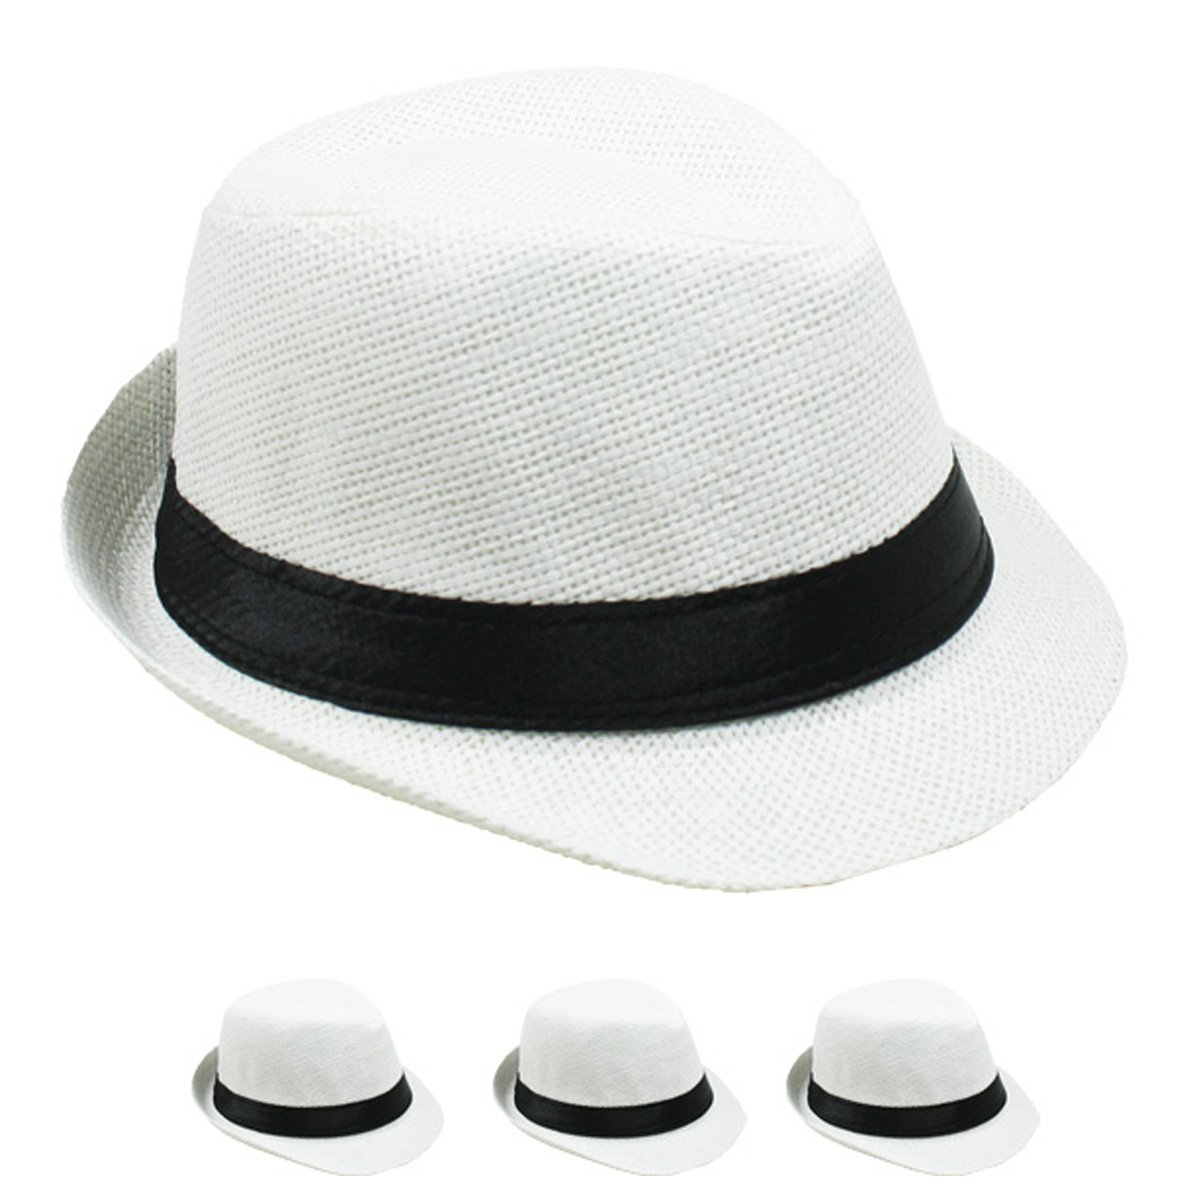 Lafashionist kids boy girls straw fedora hat summer trilby hats white  clothing jpg 1200x1200 Royal blue 49e0c0ef52e7